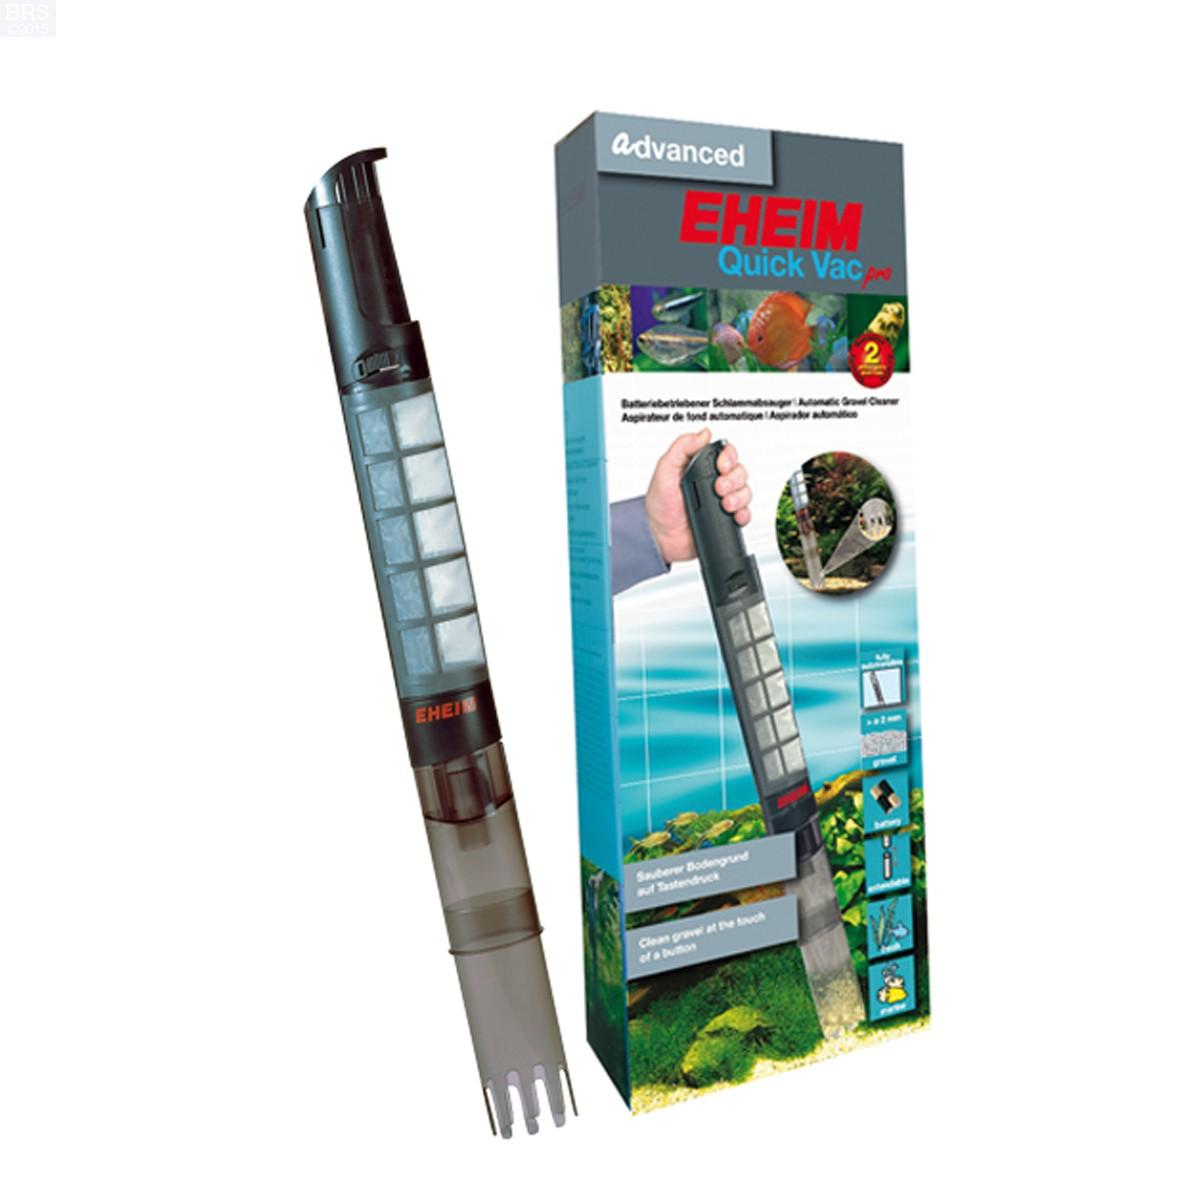 Eheim Quick Vac Pro : eheim quick vac pro bulk reef supply ~ Frokenaadalensverden.com Haus und Dekorationen